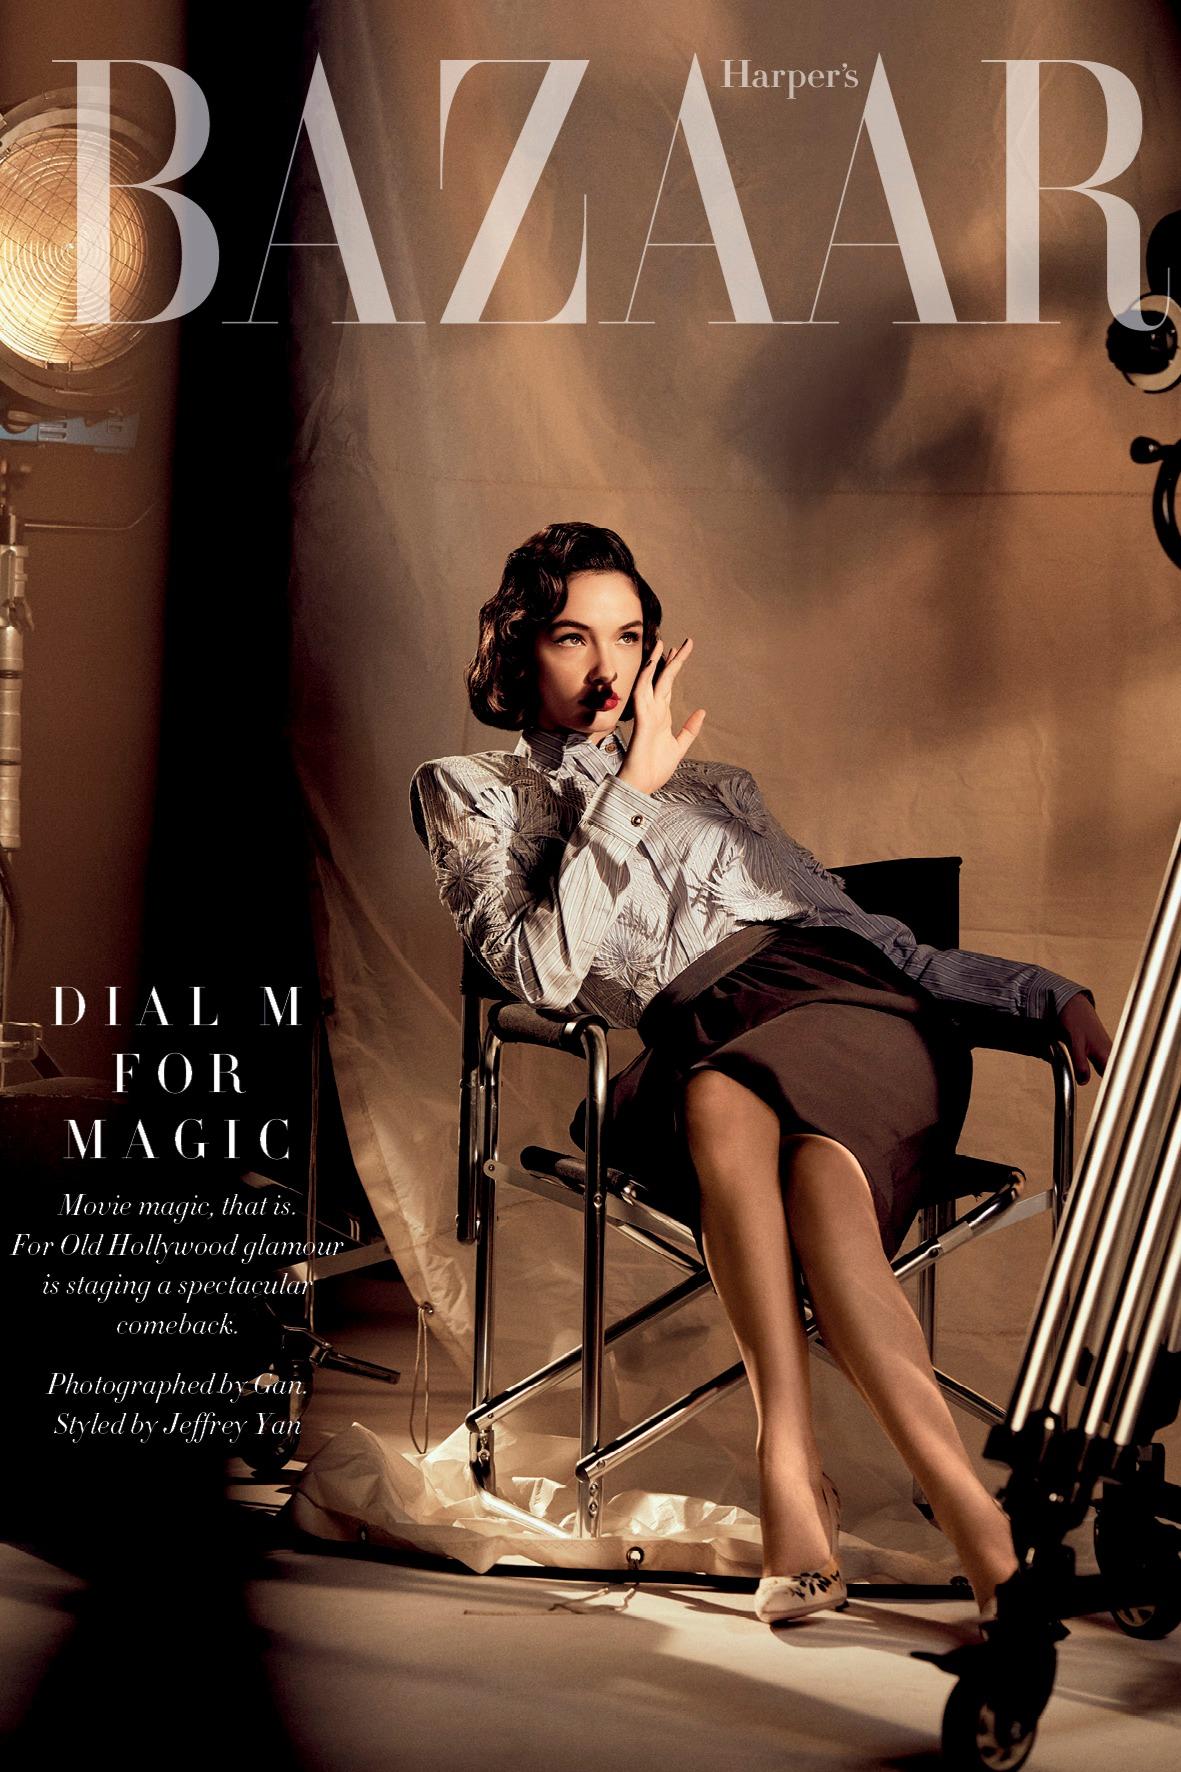 Carla Martinez for Harper's bazaar Singapore | Pride Models news